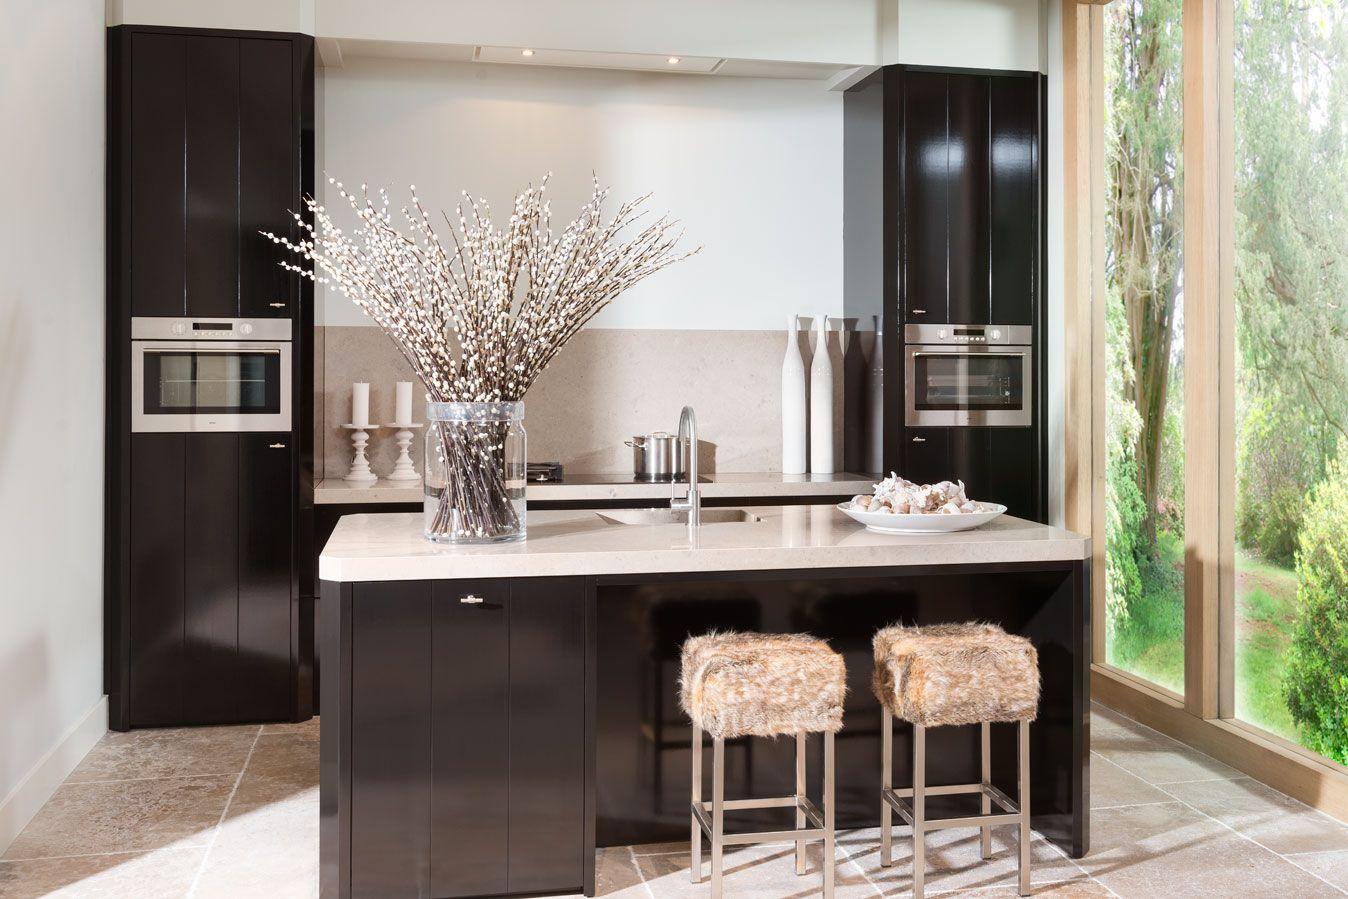 Keuken Zwart Blad : Keukens badkamers sauna s en sanitair jan van sundert keuken